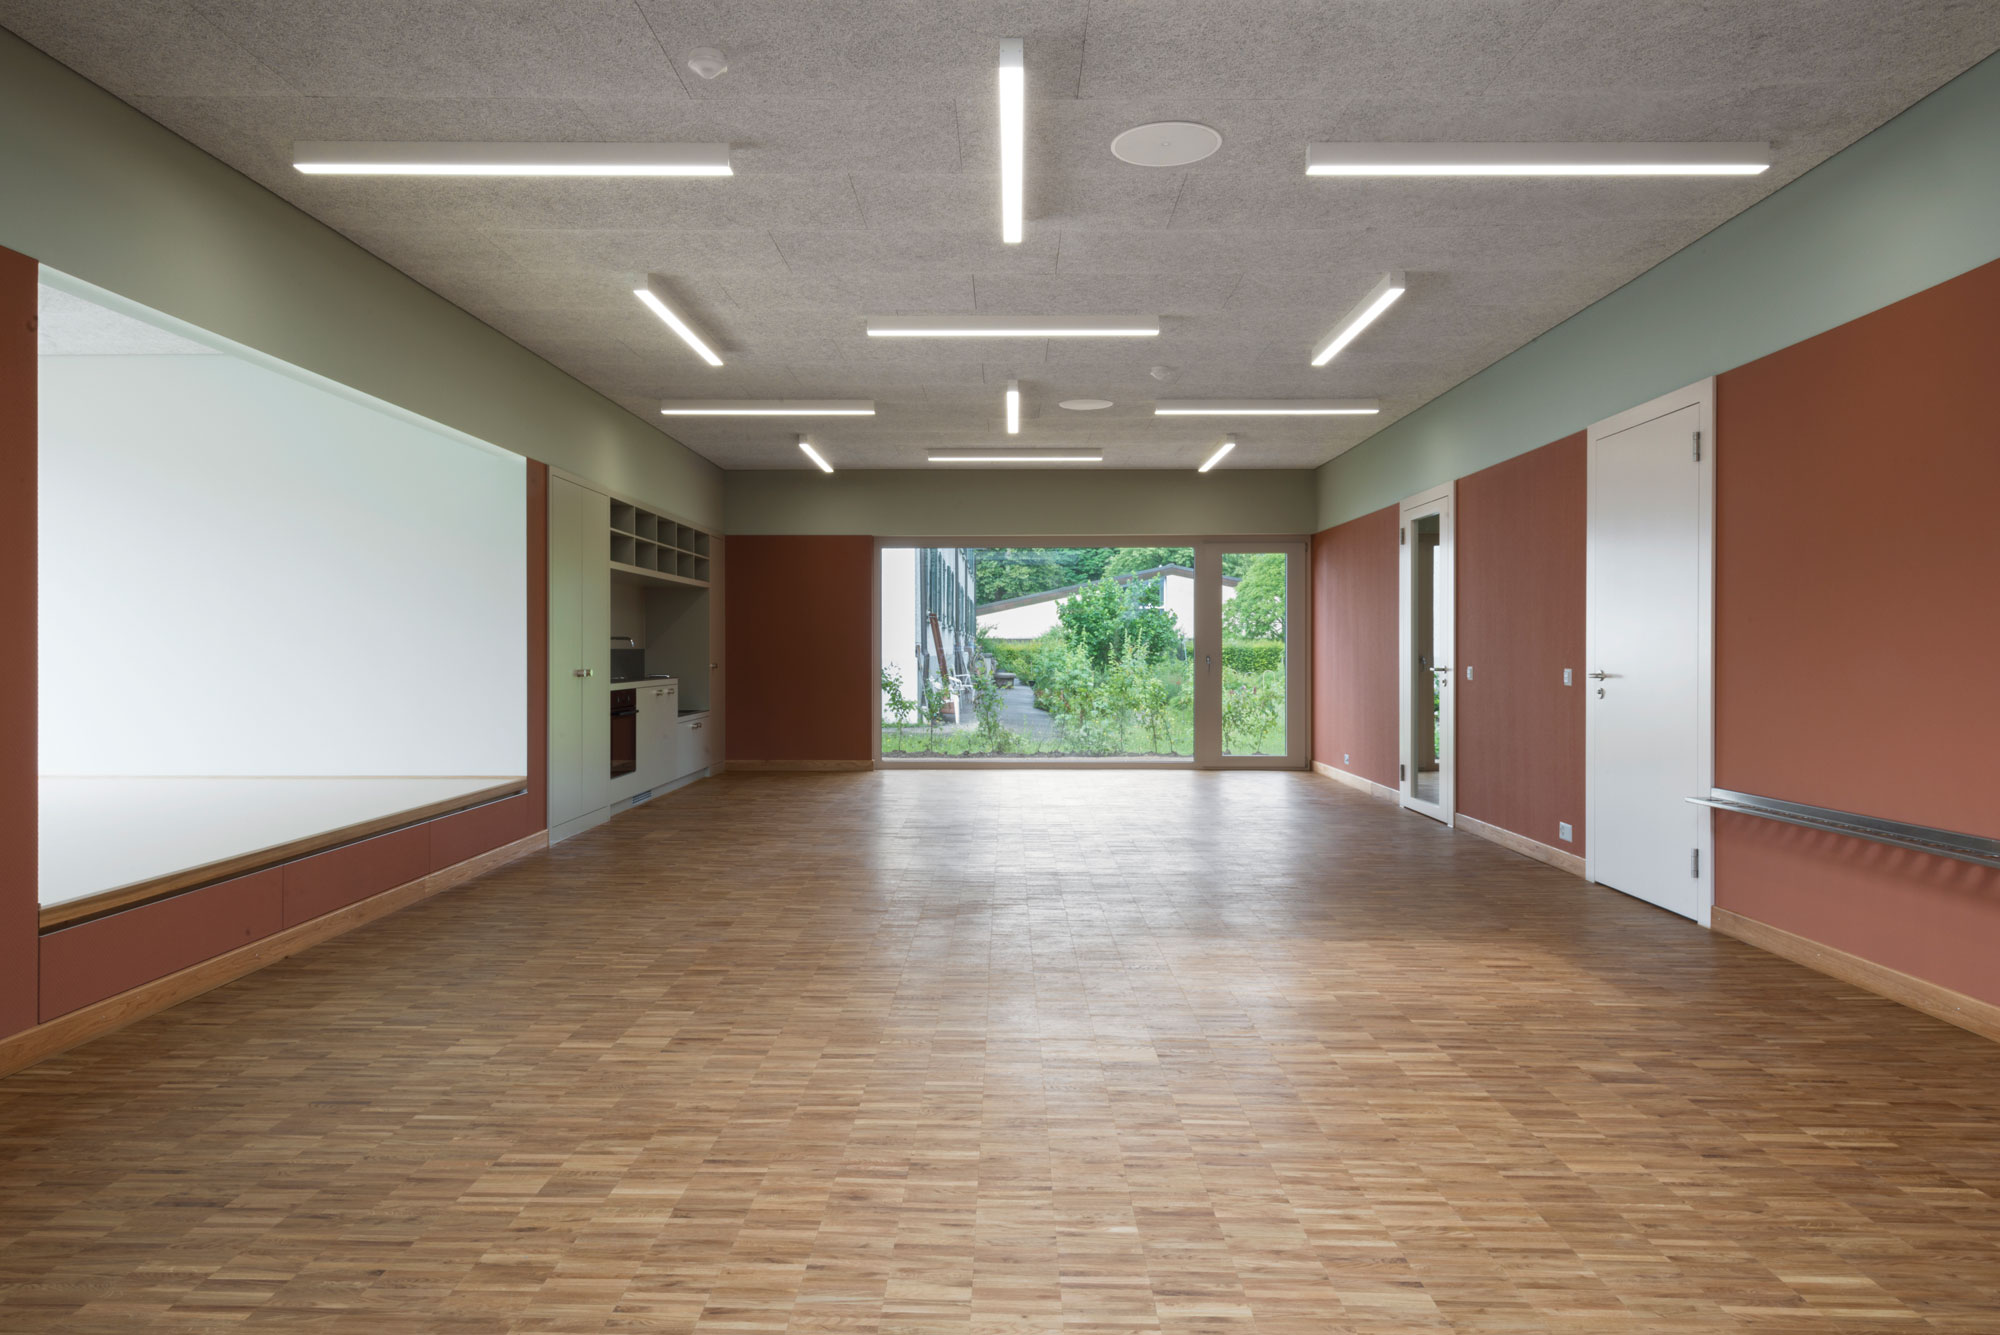 MAA_Murer_Andre_Kindergarten_AareNord_Aarau_015.jpg